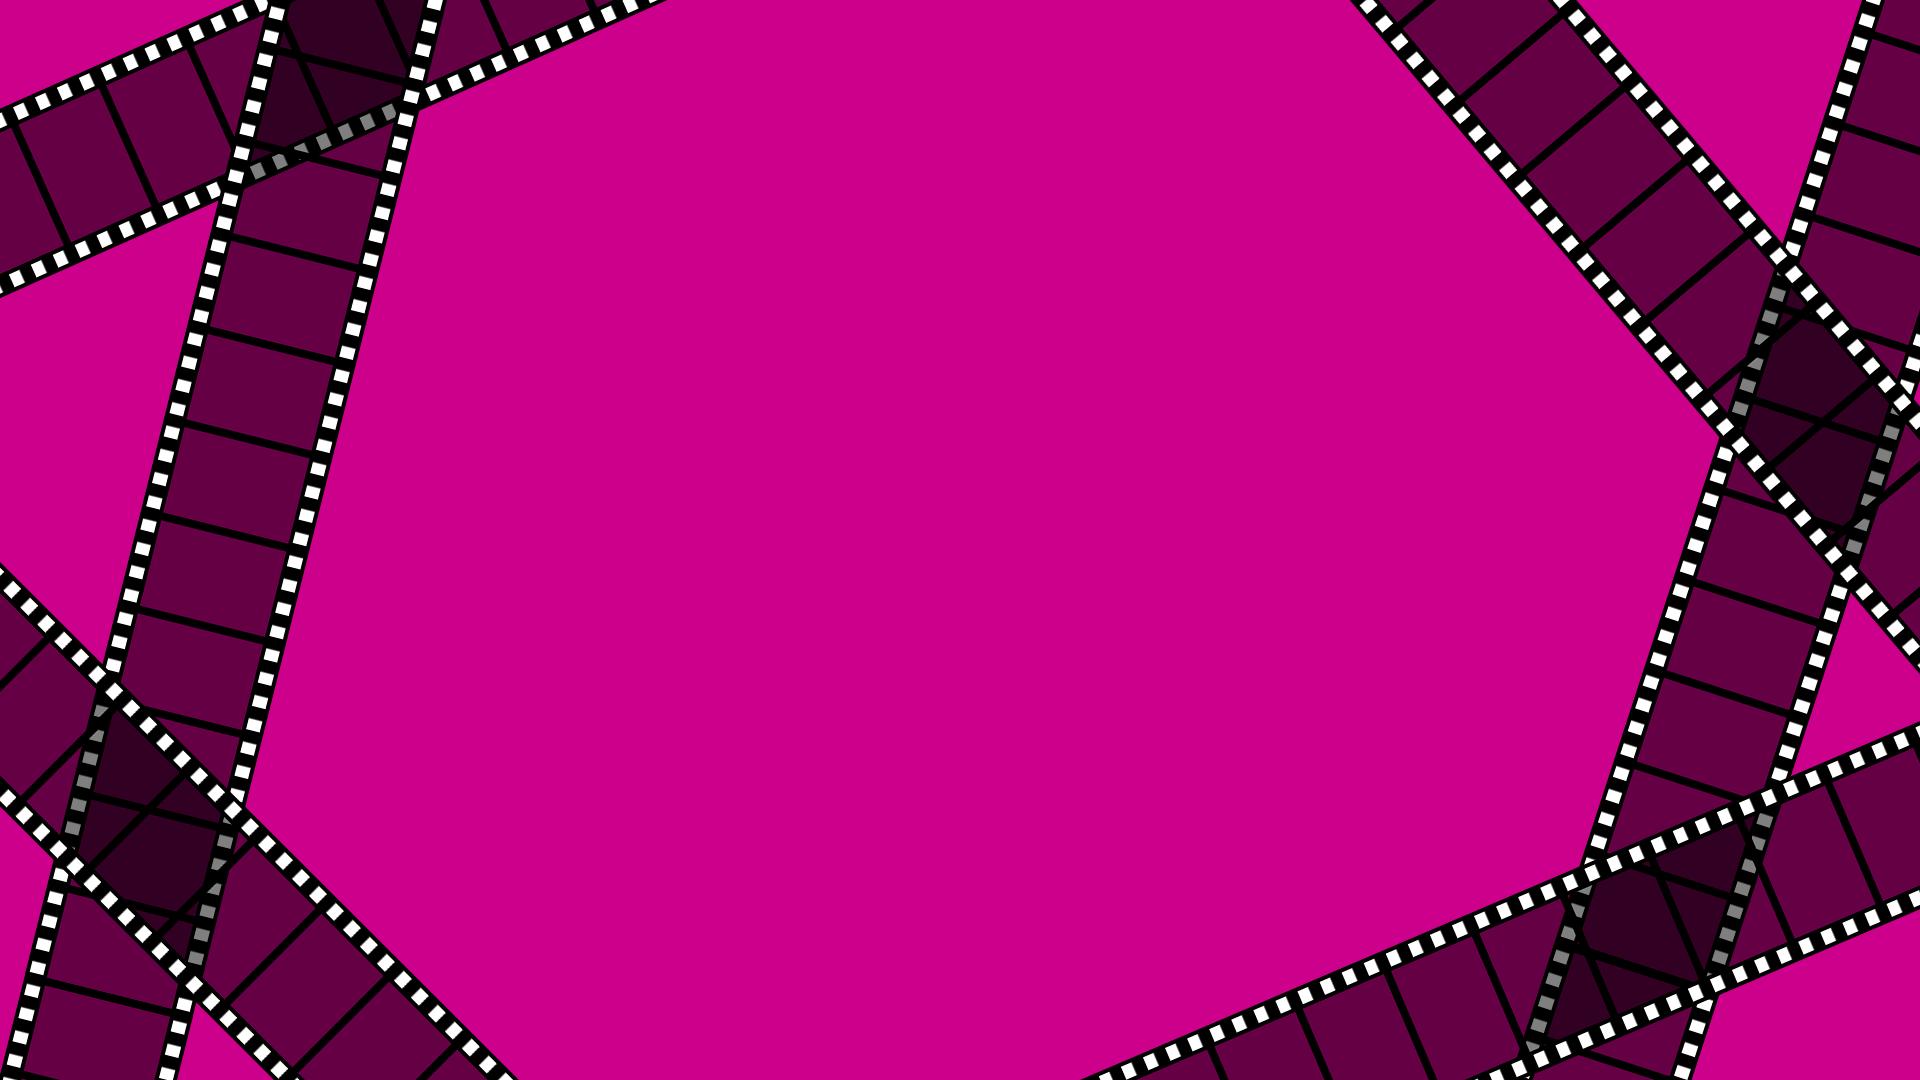 Cute Black And Pink Wallpaper 1 Wallpaper   Hdblackwallpapercom 1920x1080